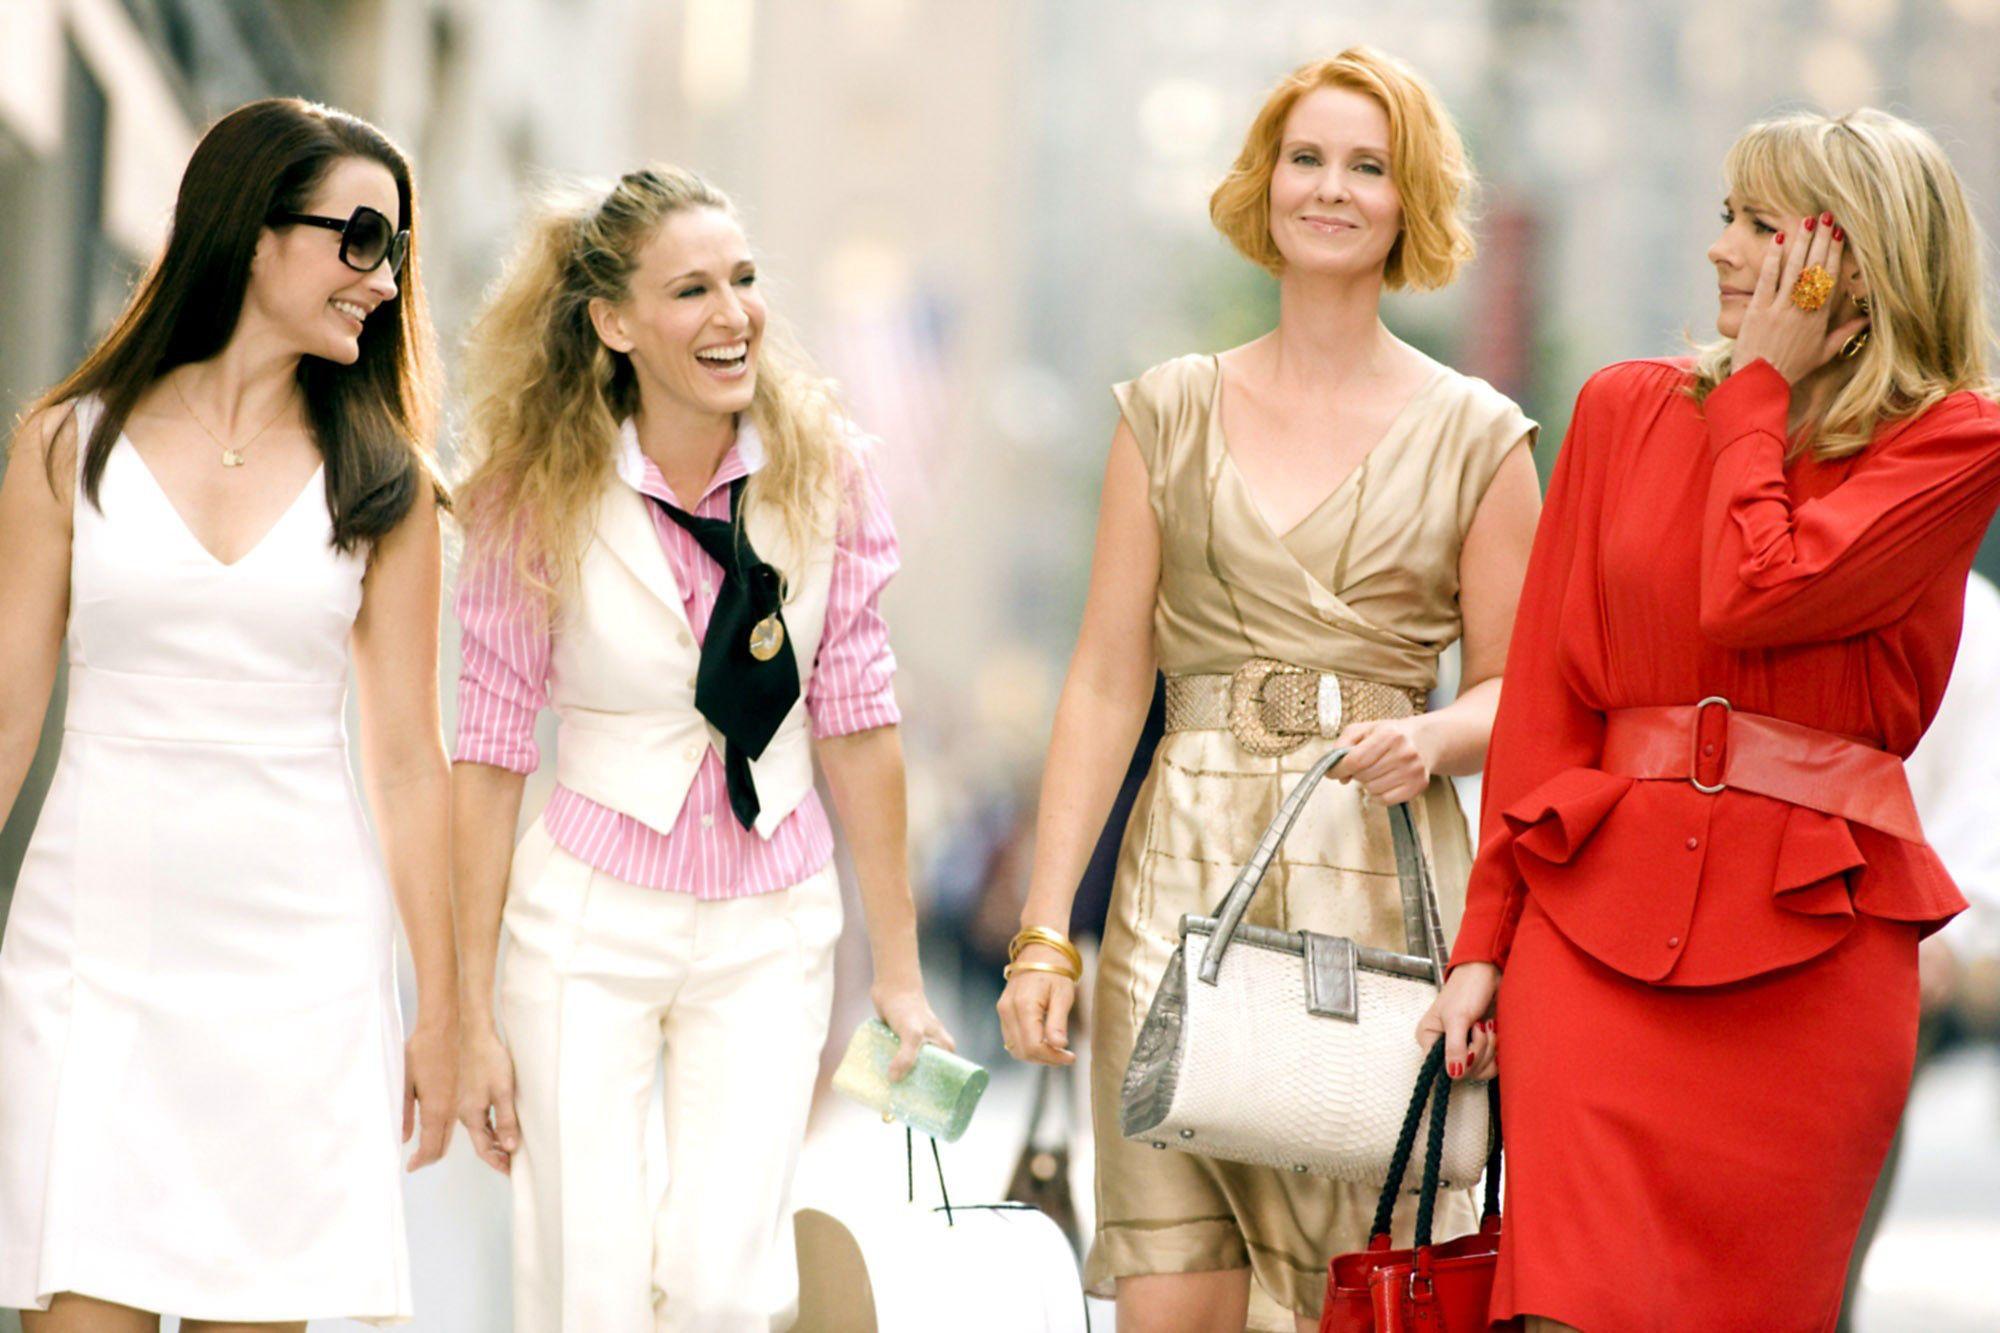 New Yorkers are hoping Cynthia Nixon is exactly like Miranda